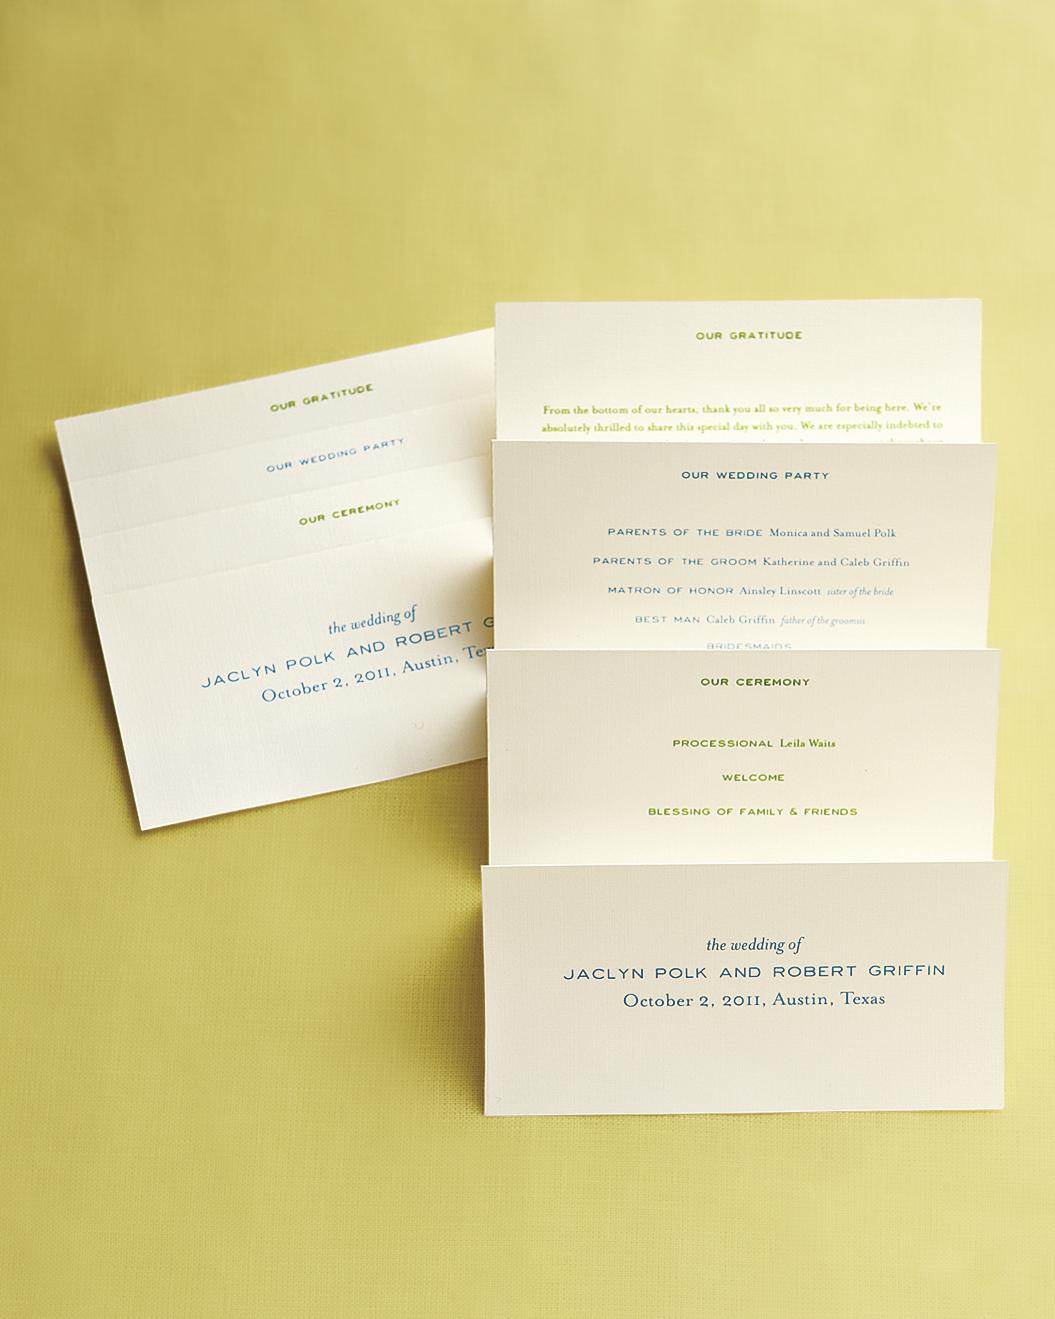 diy-wedding-ceremony-programs-mwd106511programs15-0515.jpg